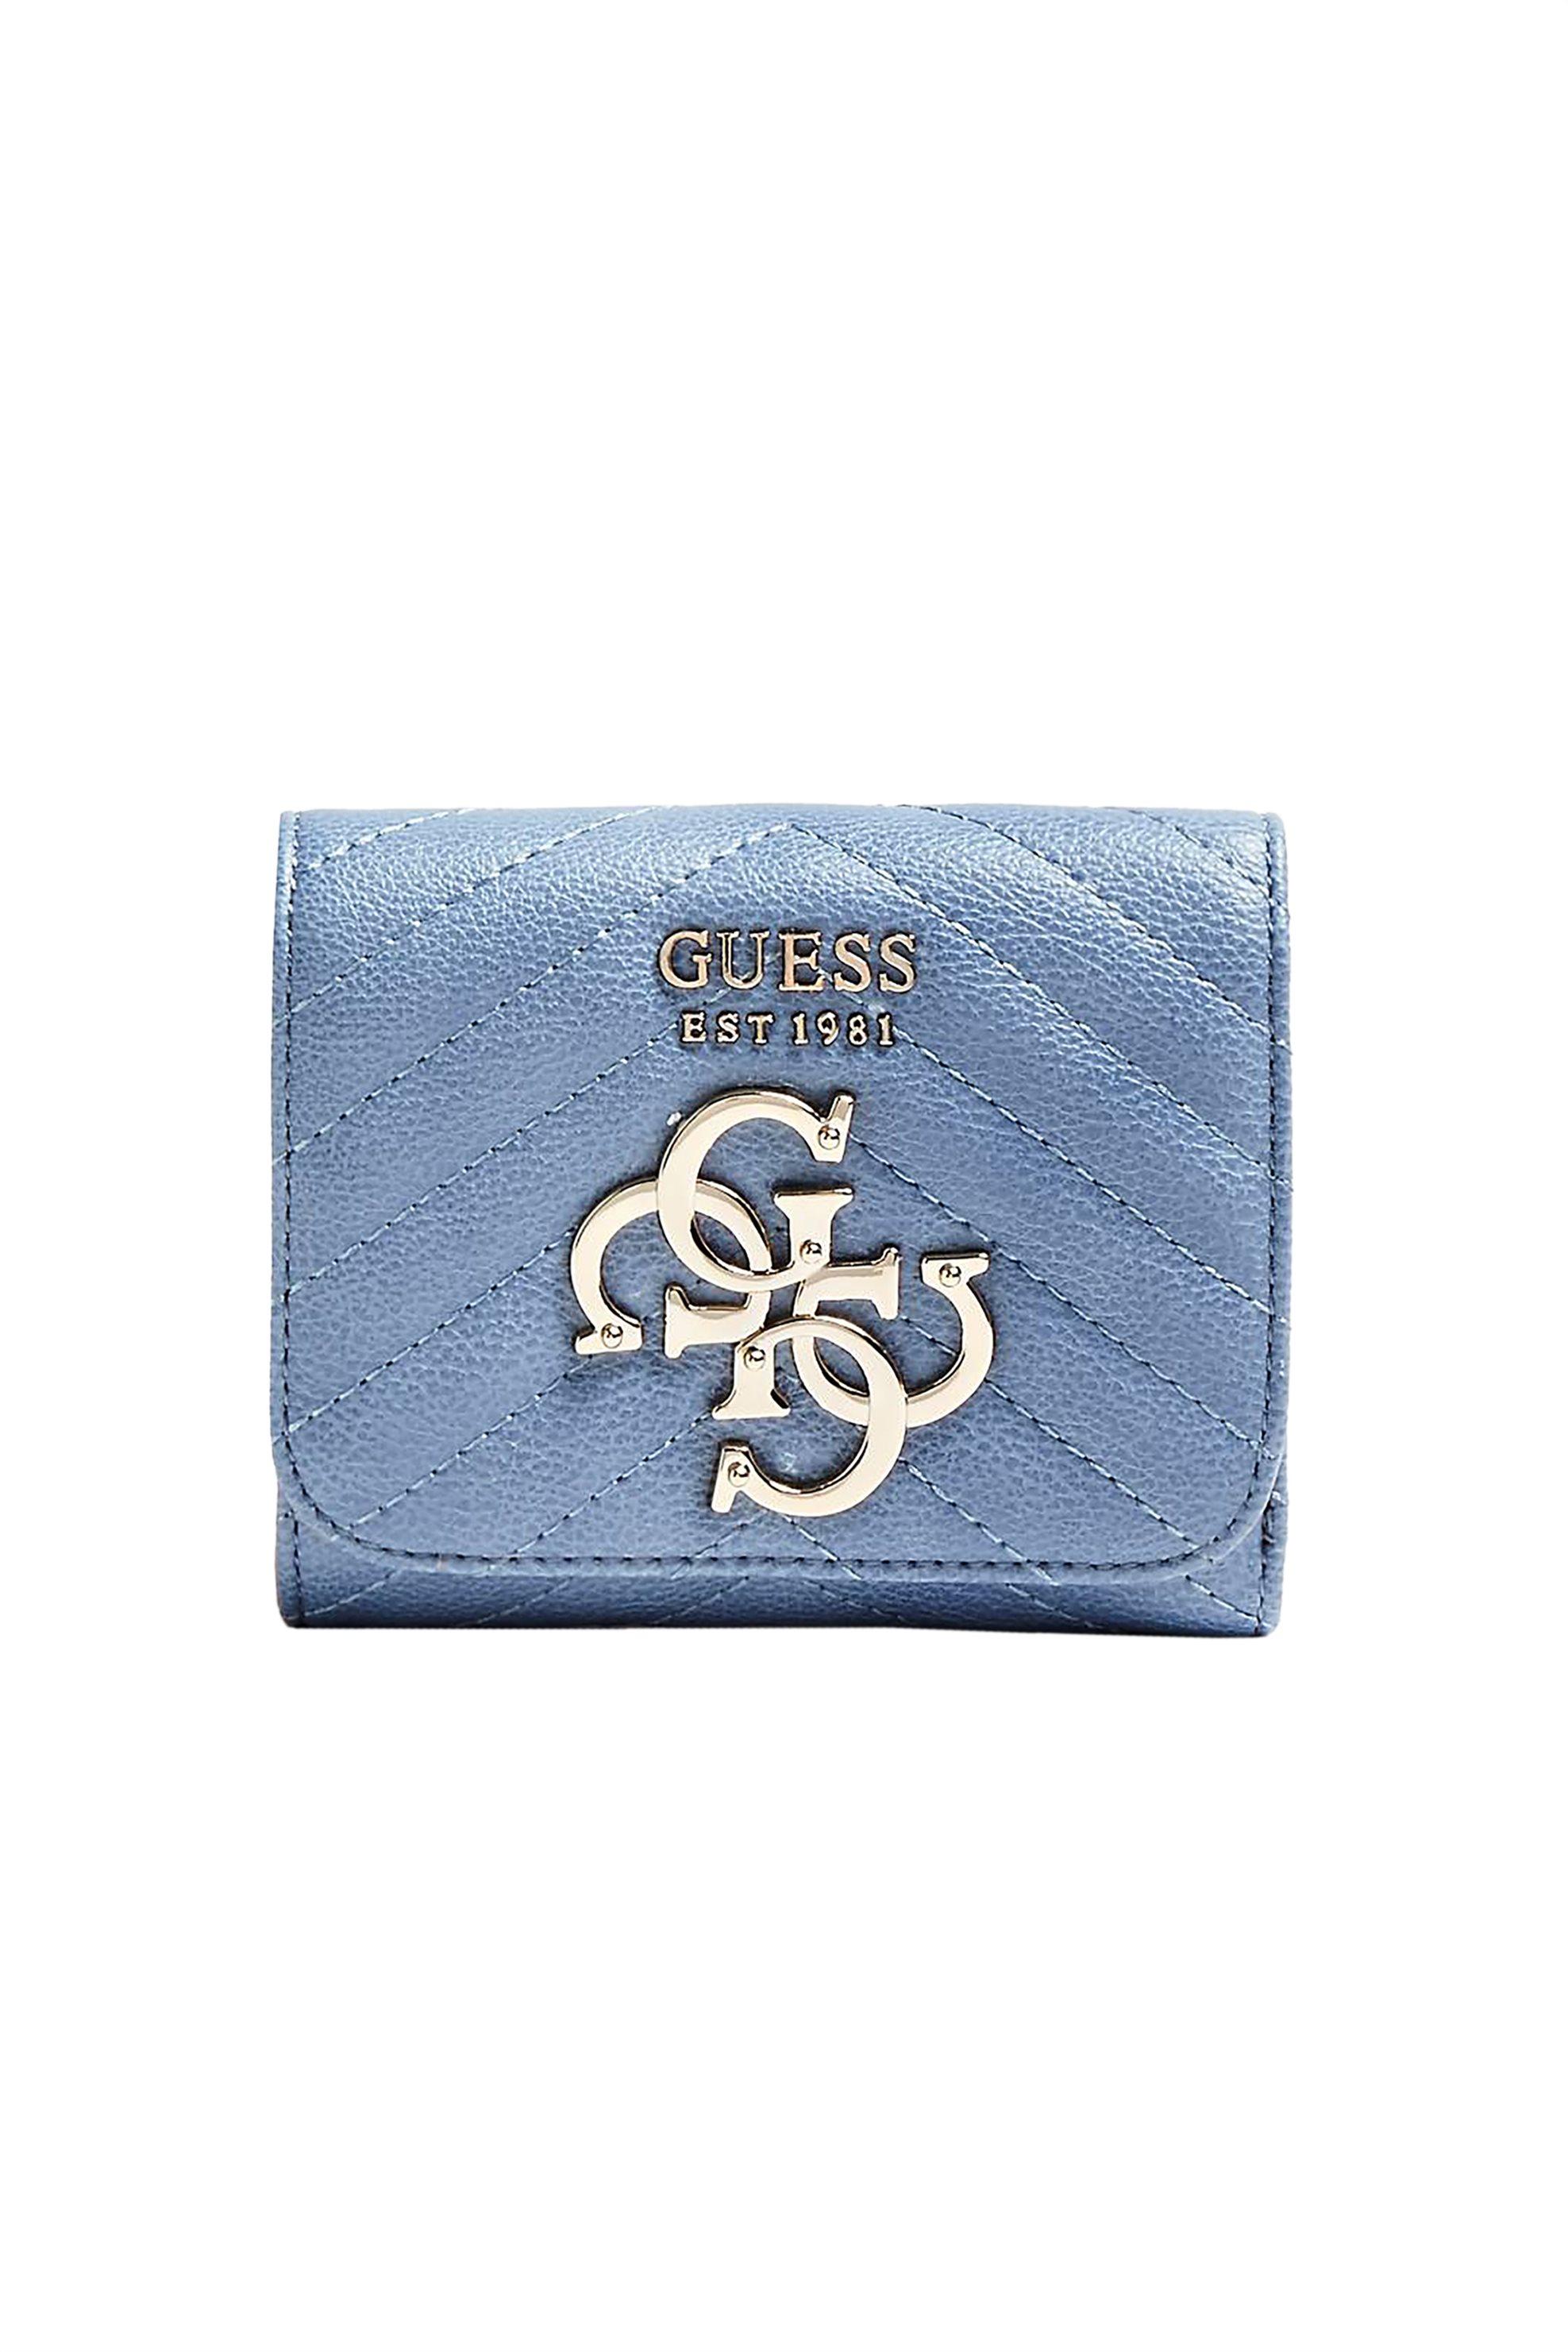 bd3c37239a Notos Guess γυναικείο πορτοφόλι Violet - SWVG7294430 - Γαλάζιο